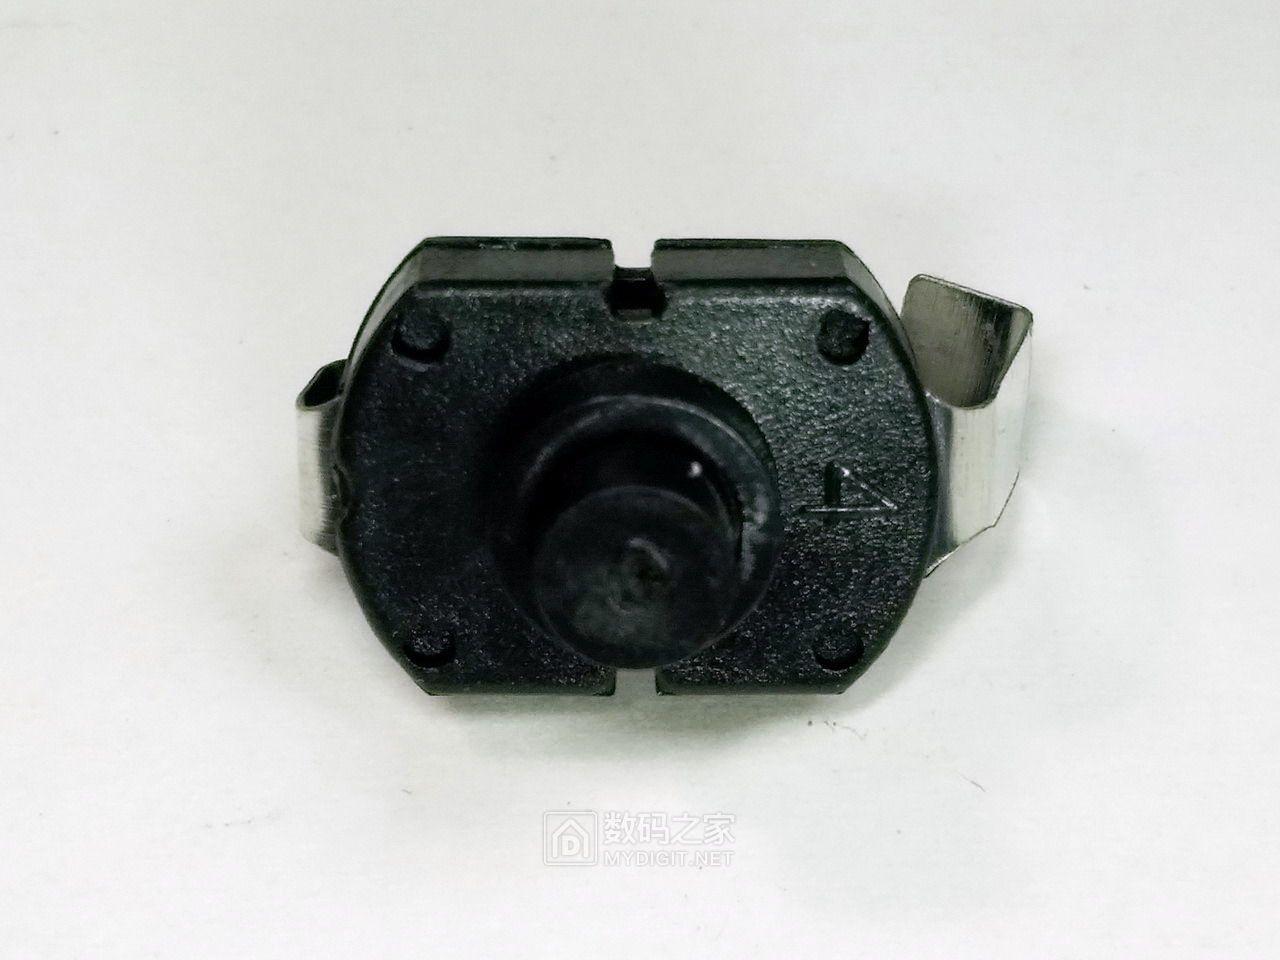 P91117-223943.jpg